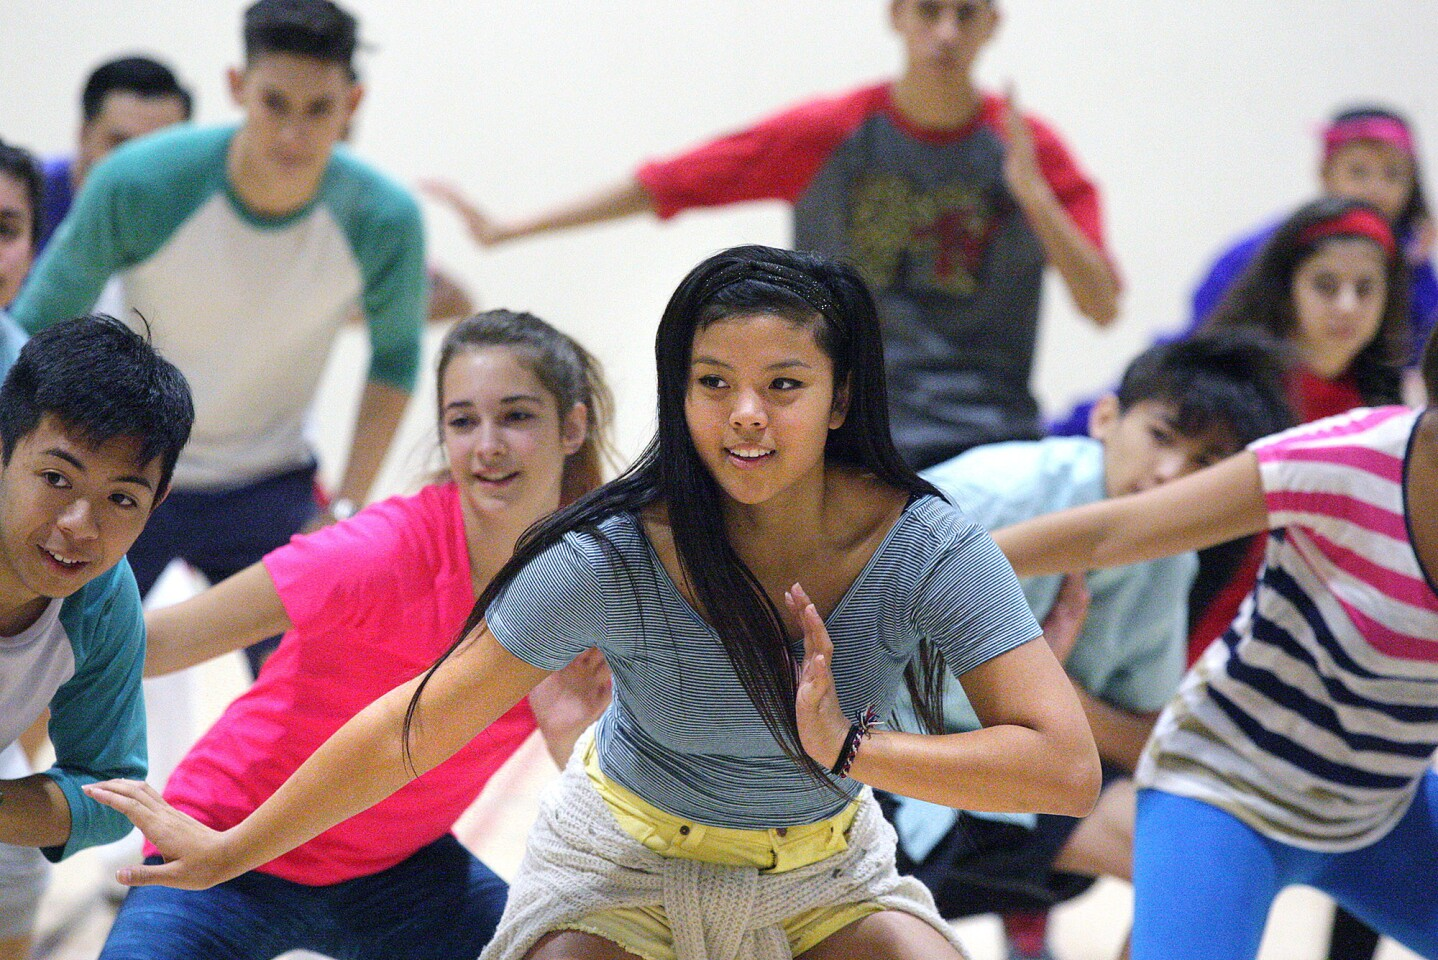 Photo Gallery: Glendale High School Dance team learns